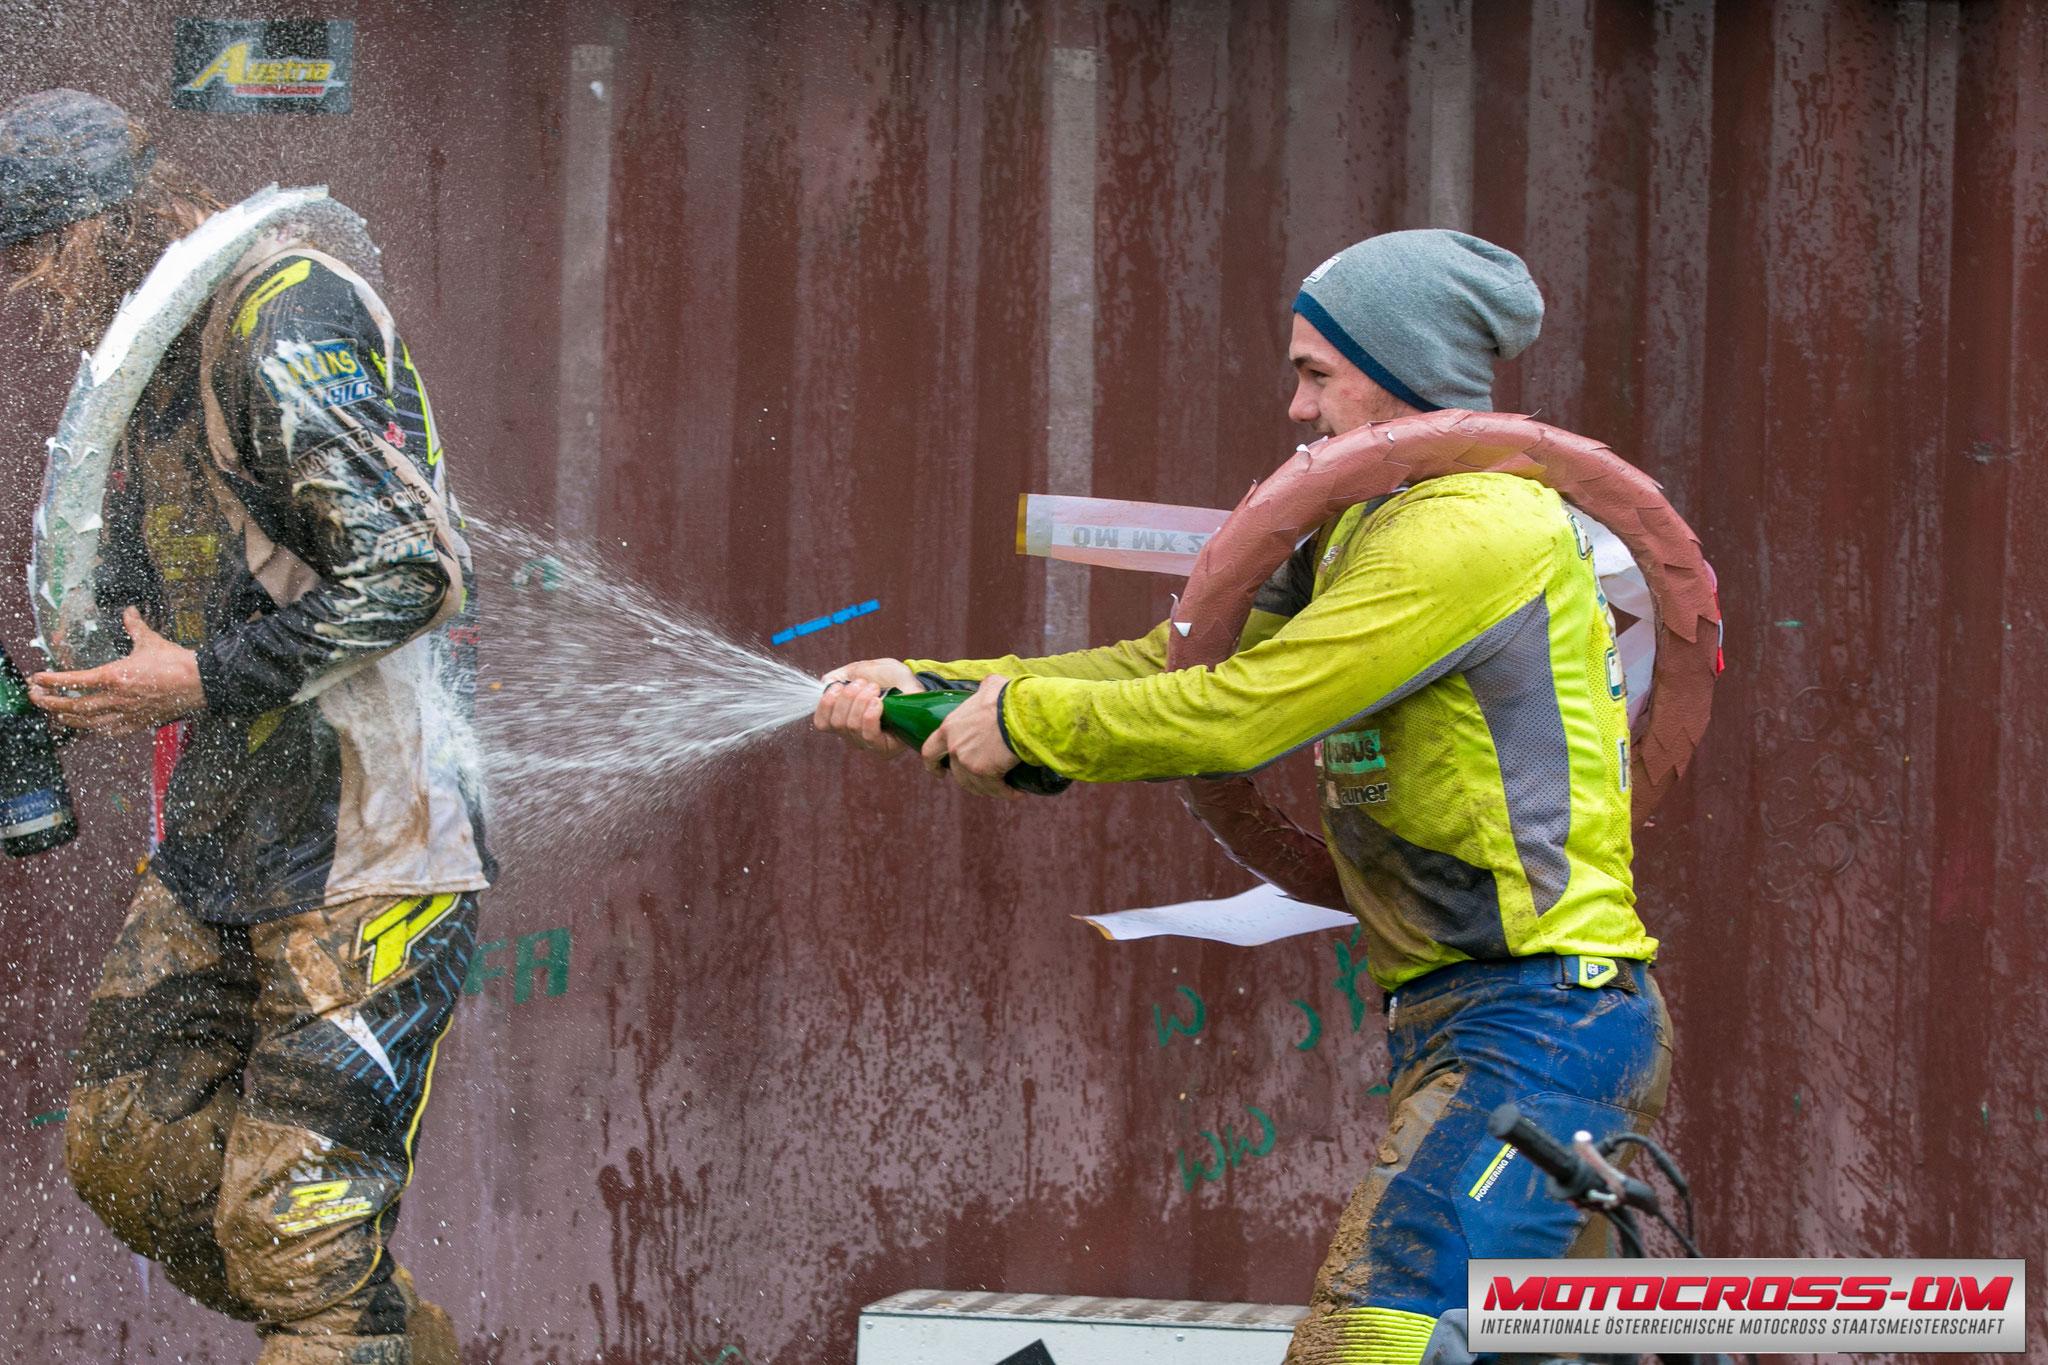 Foto: Motocross ÖM / Laebe